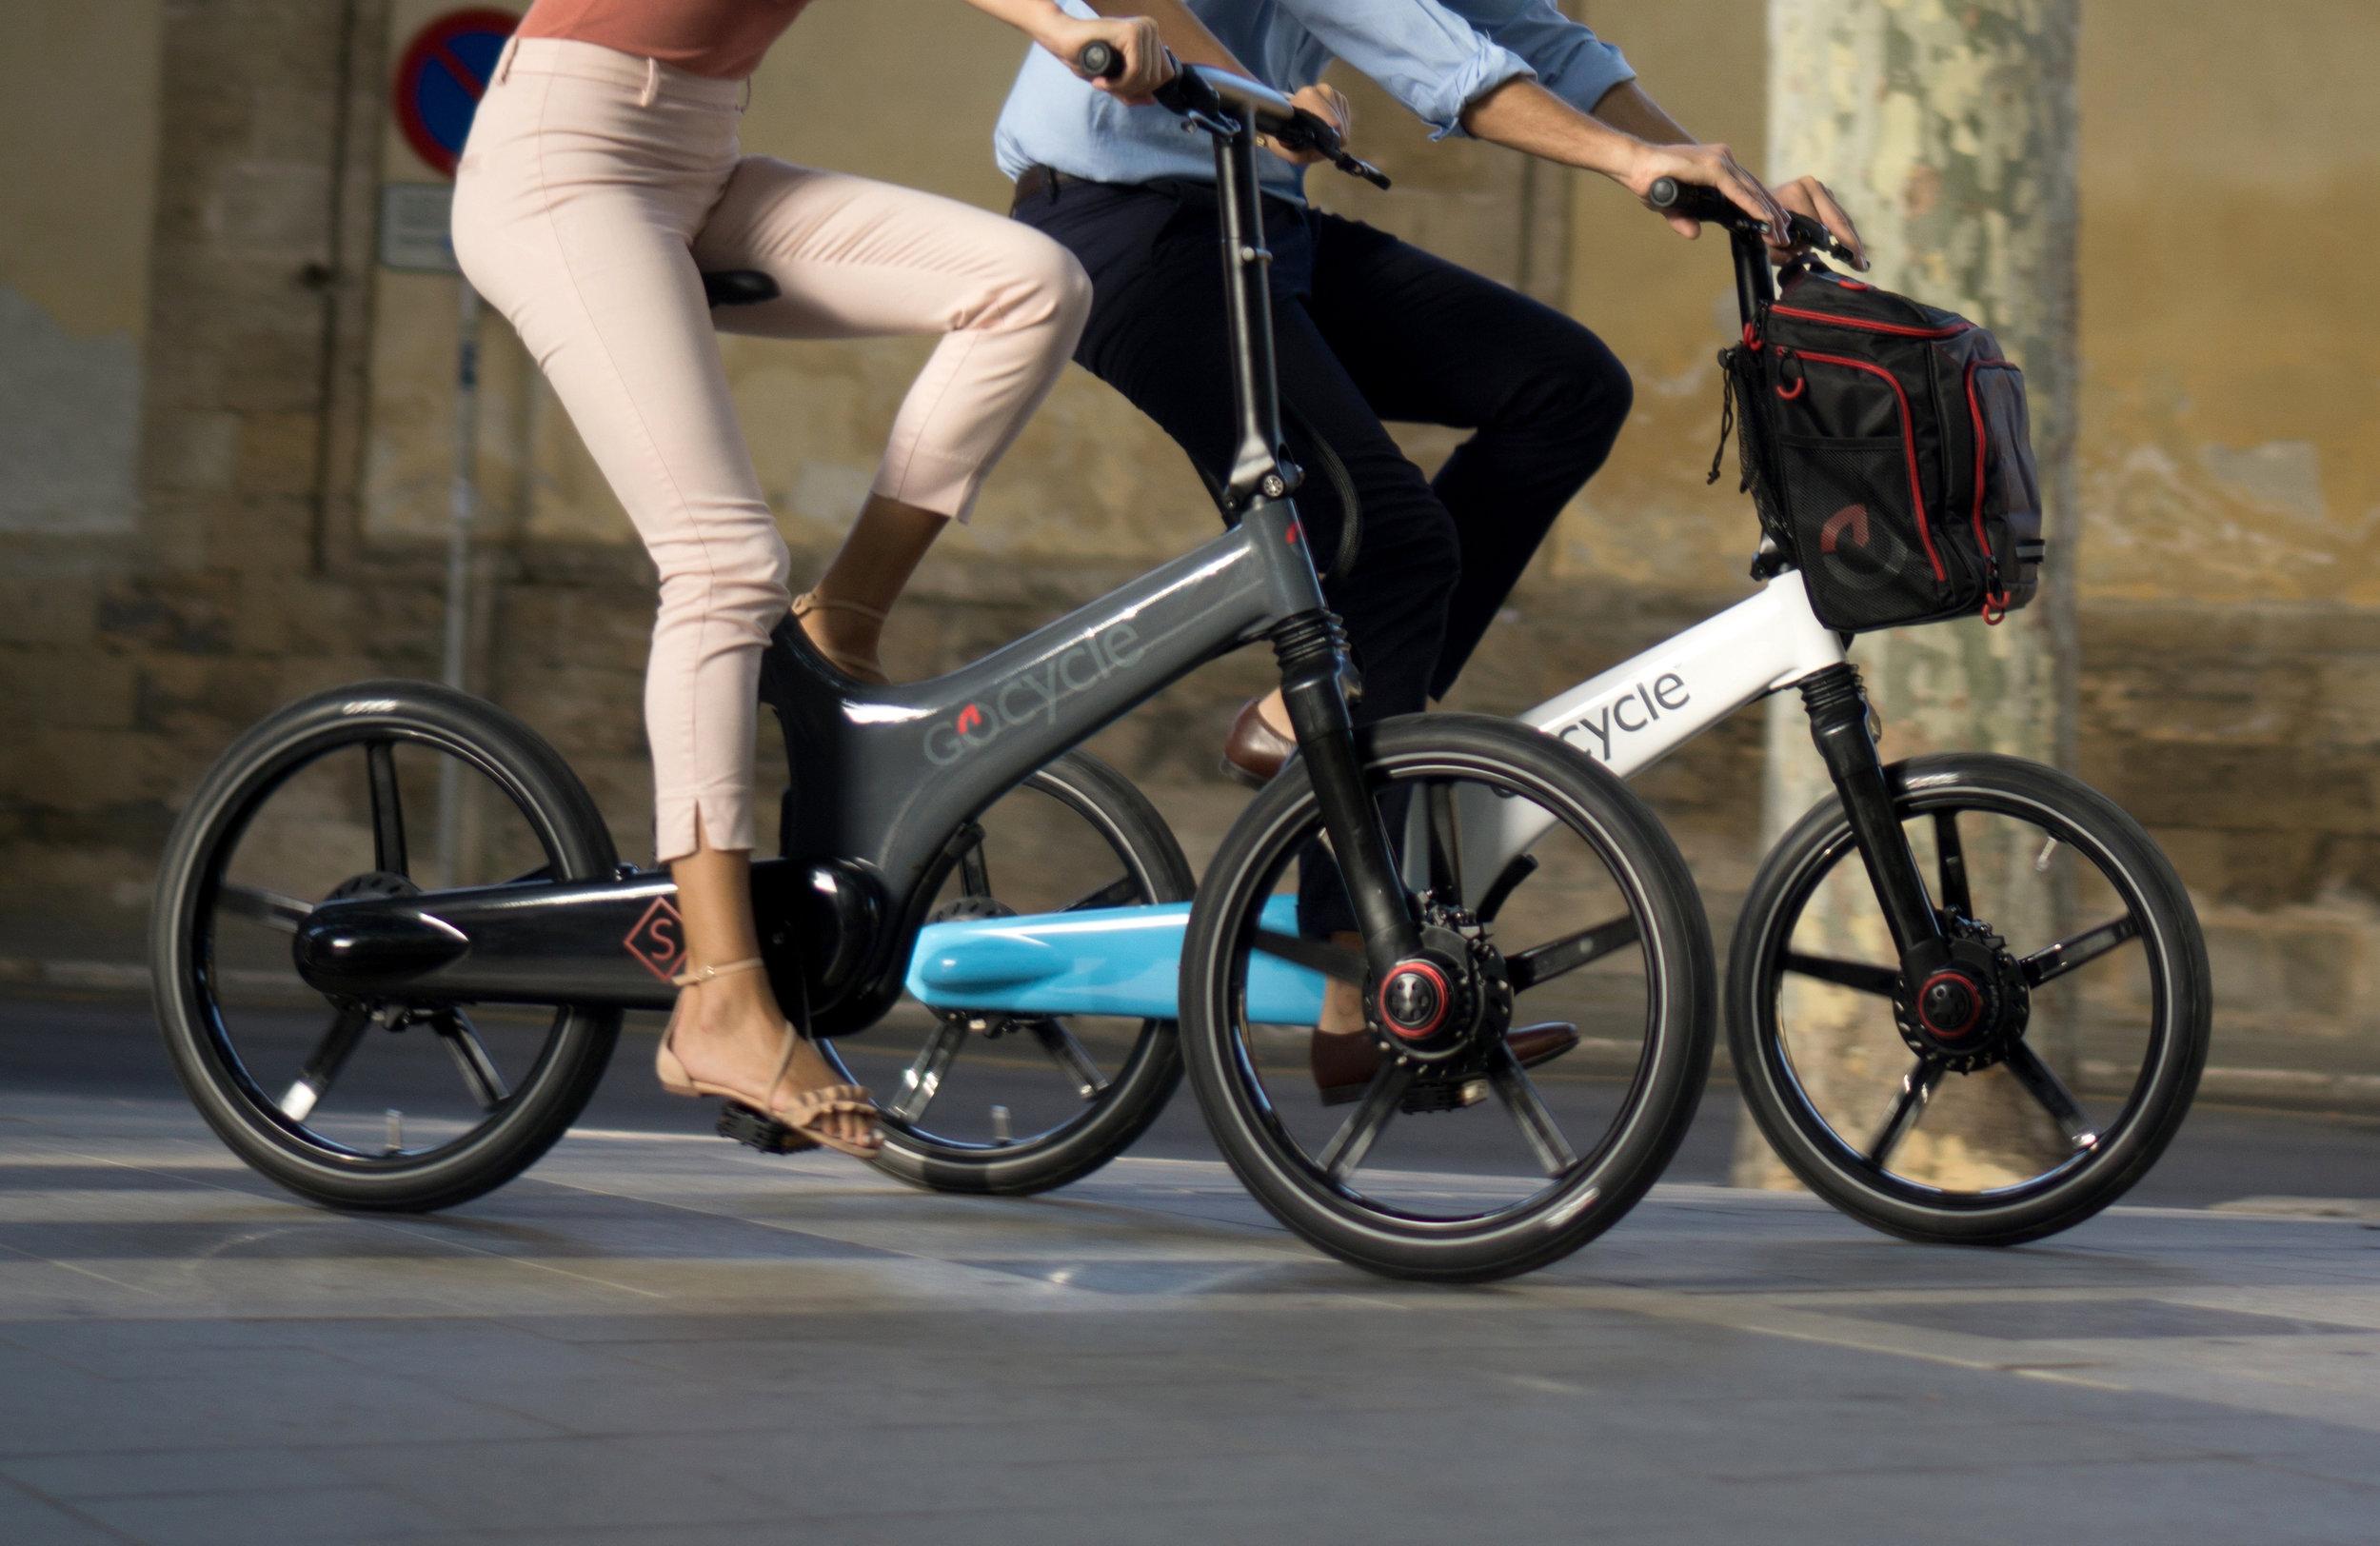 Gocycle Electric Bikes -